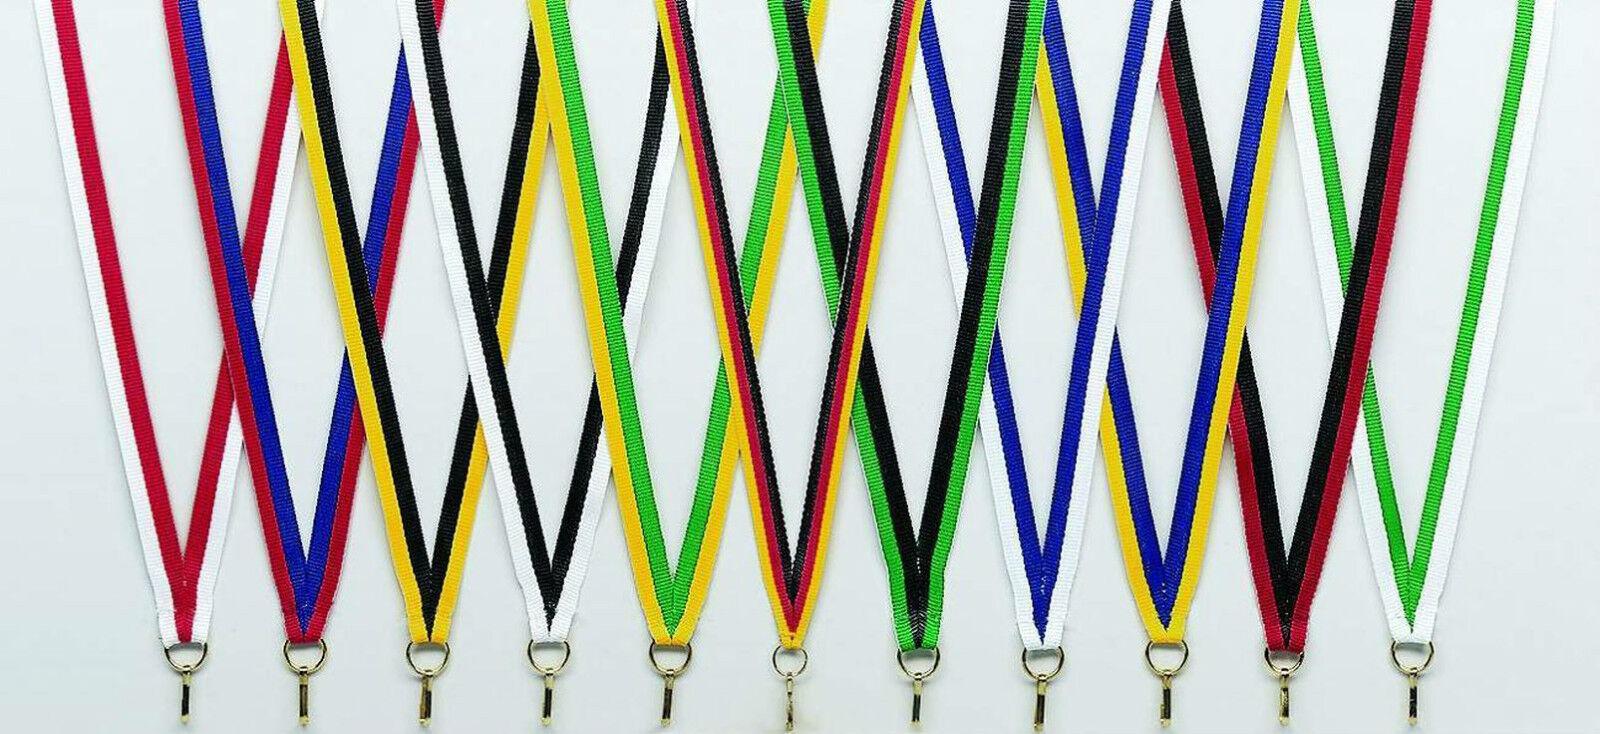 100 Bänder schmal sofort verfügbar (Sport (Sport (Sport Sieger Turnier Pokal Medaille Gravur) 715e81